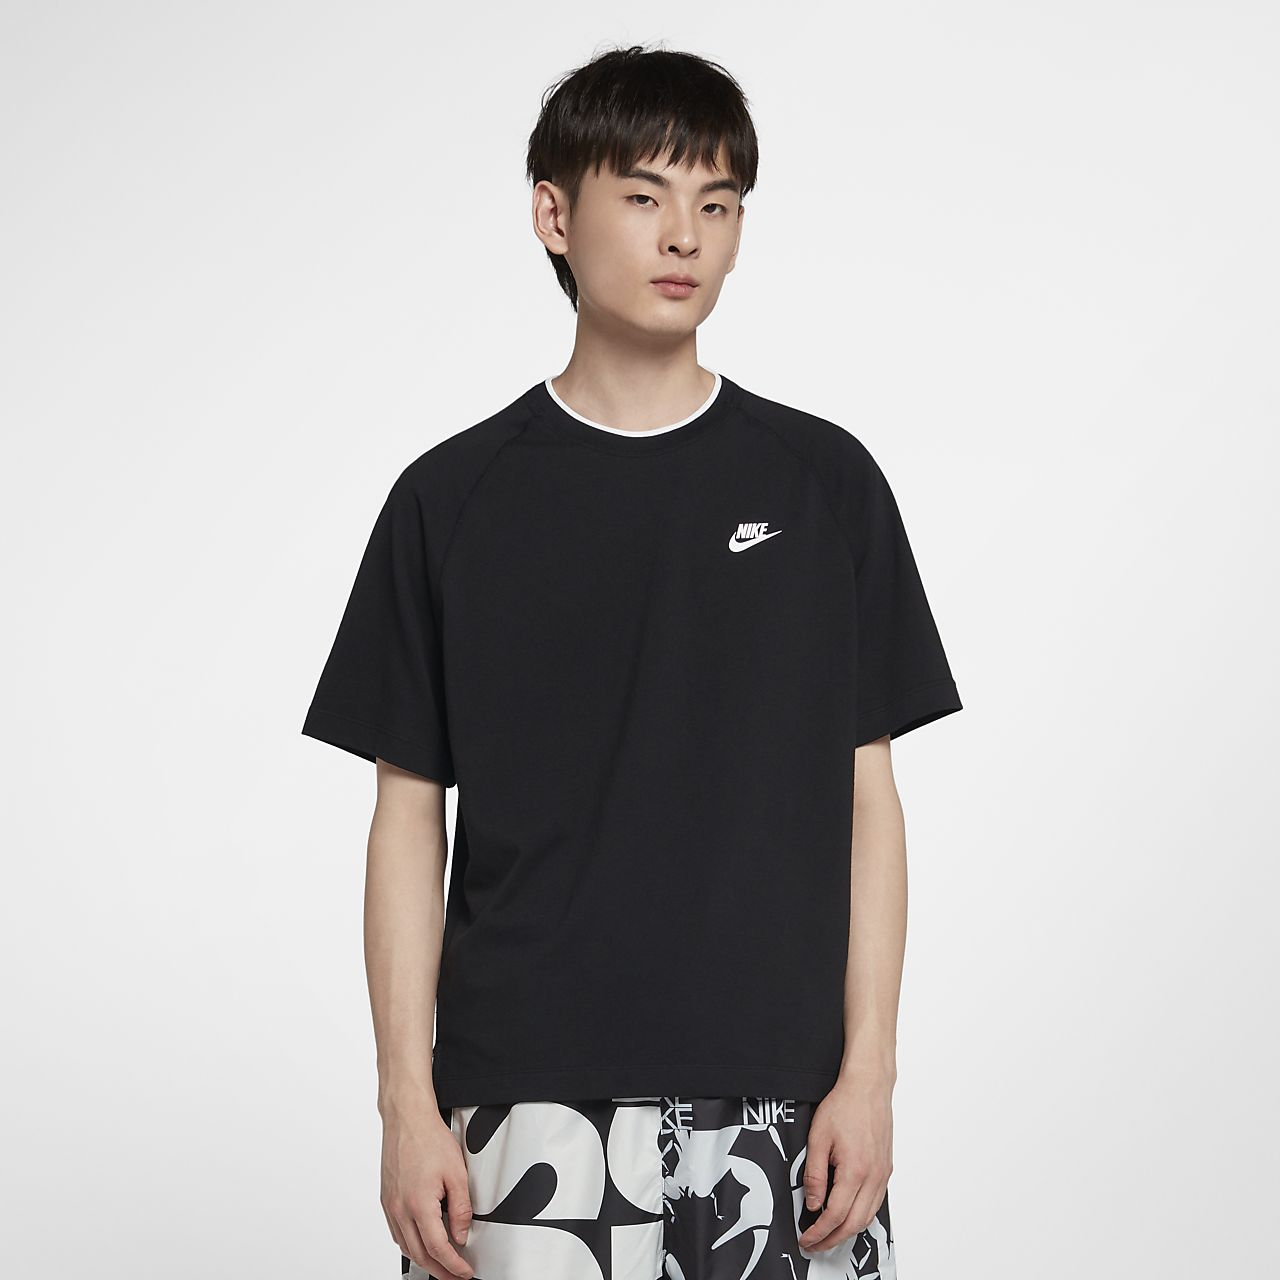 Nike Sportswear 男子短袖针织上衣